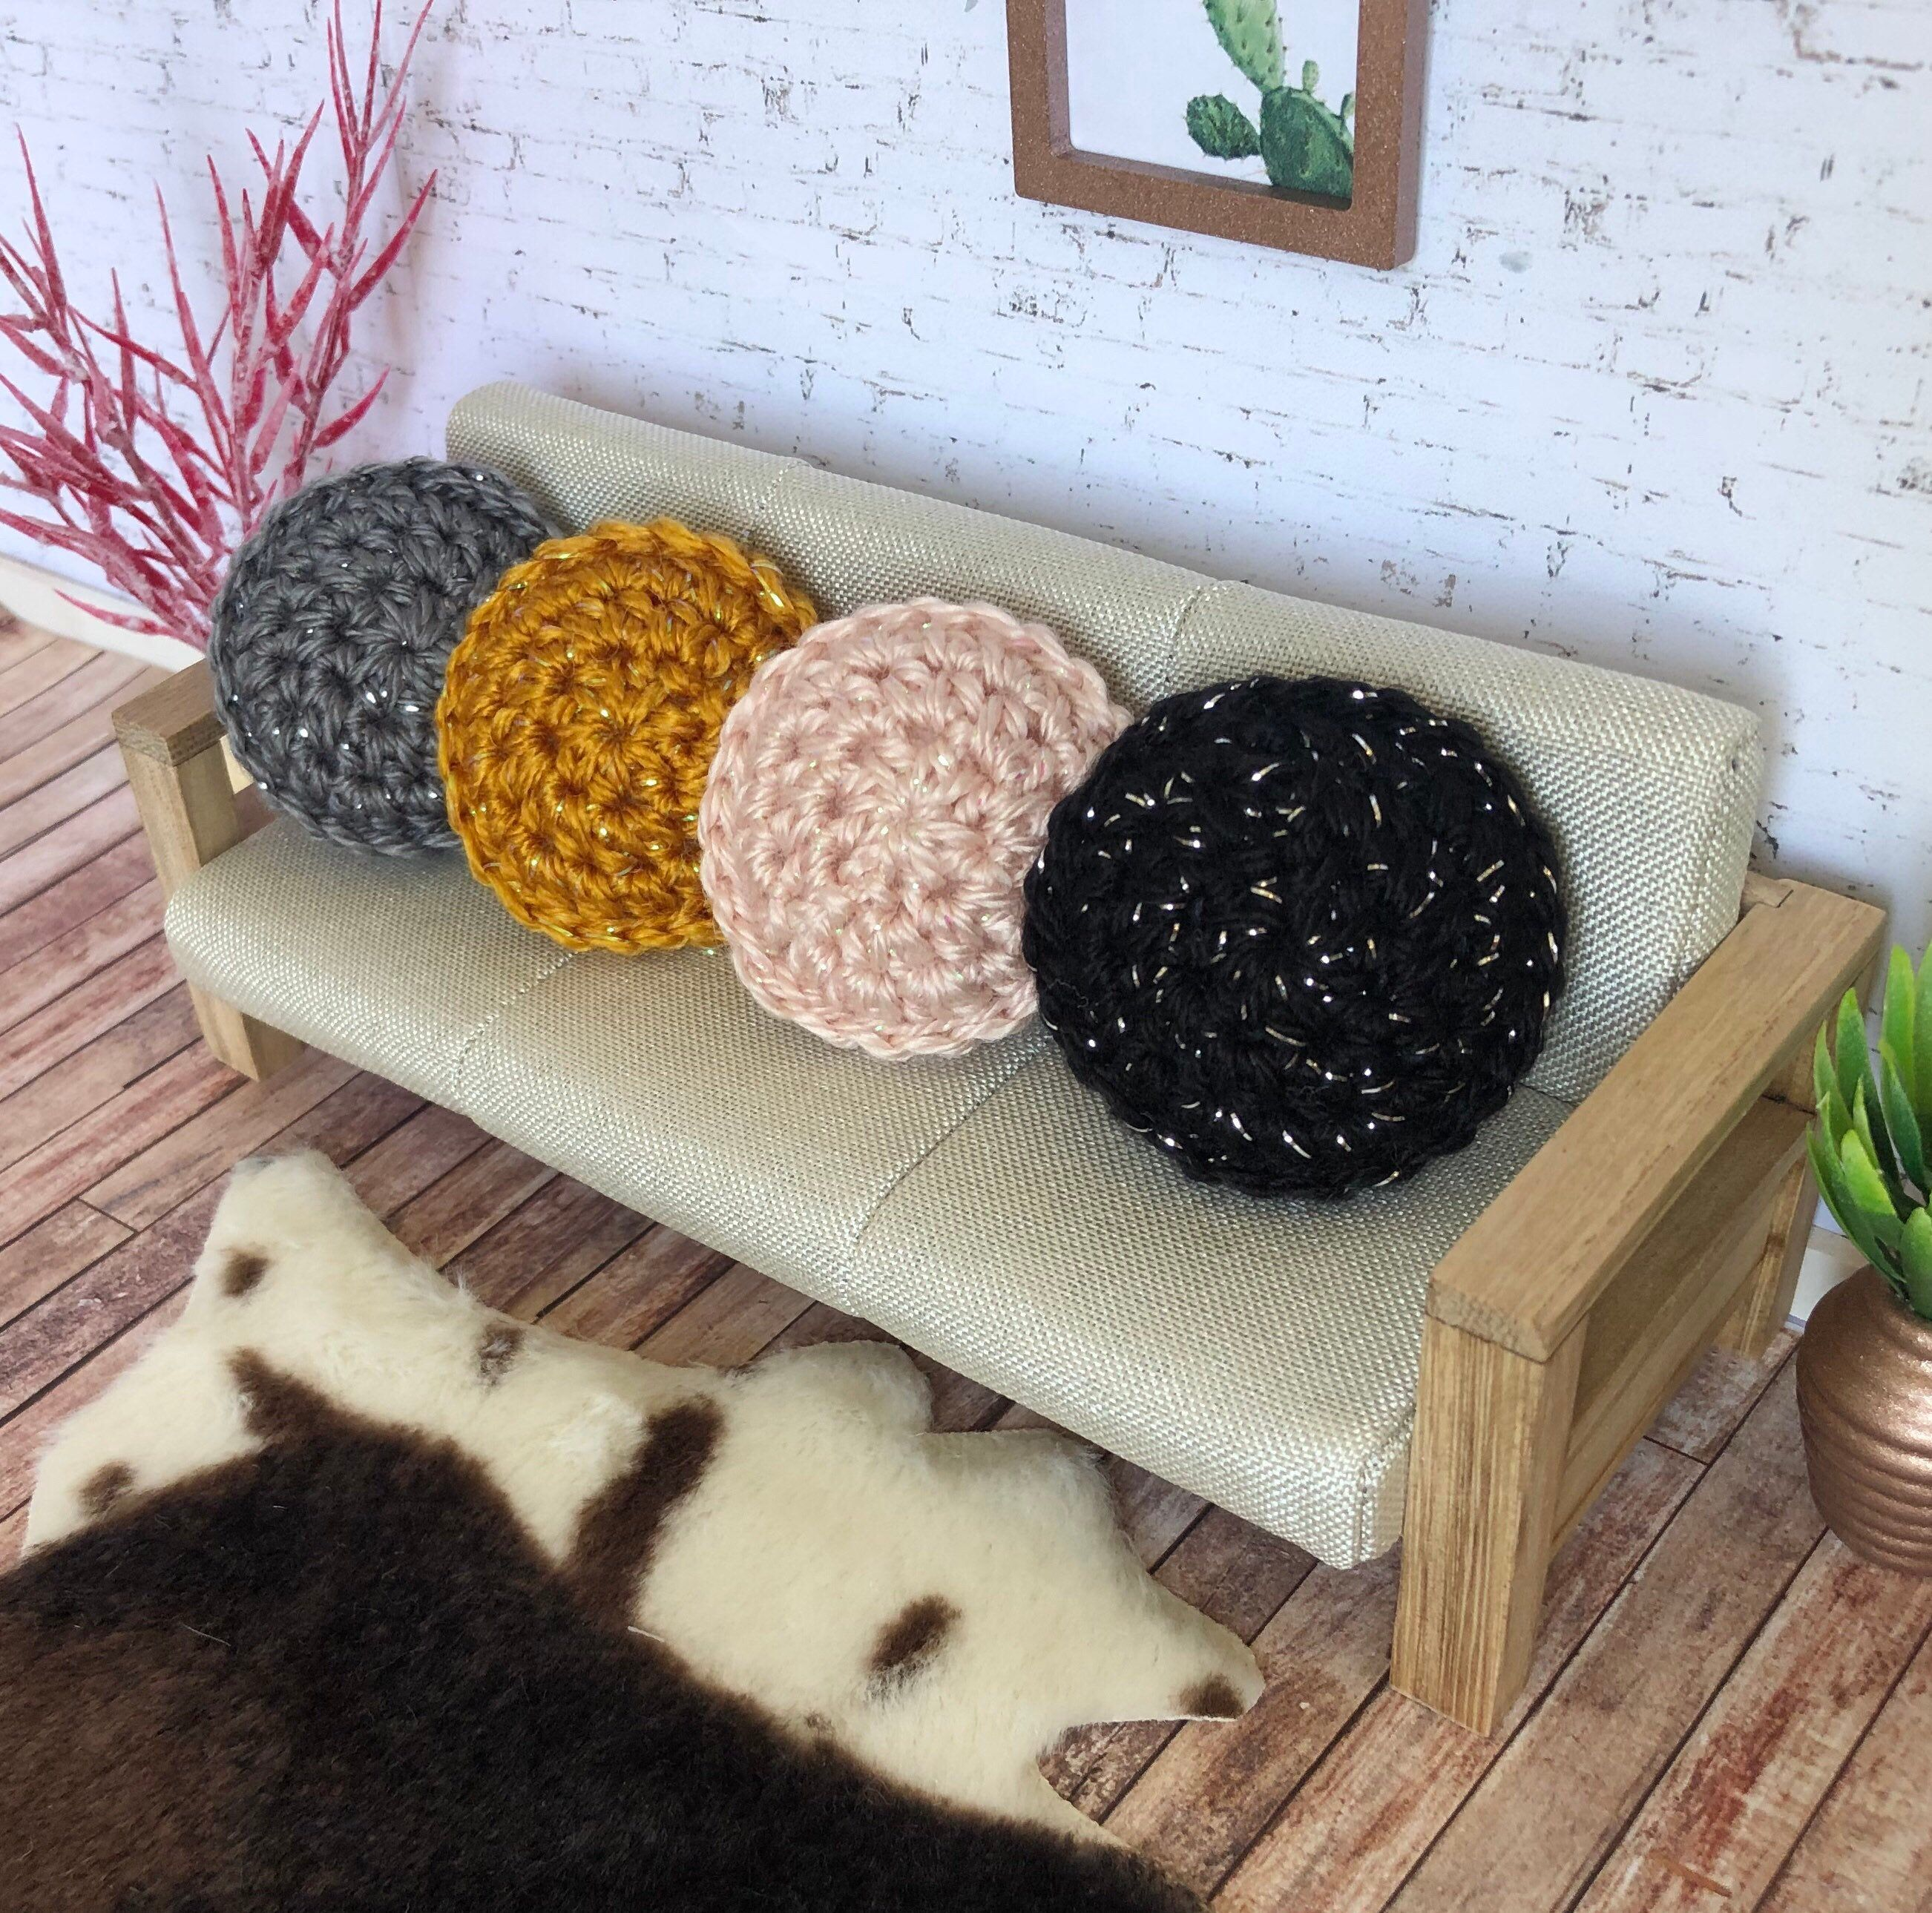 Miniature Round Cushion 1:12 Scale - Sparkle Yarn - Black Grey Pink Mustard - Round Dollhouse Cushions - Round Pillow - Crochet Cushion